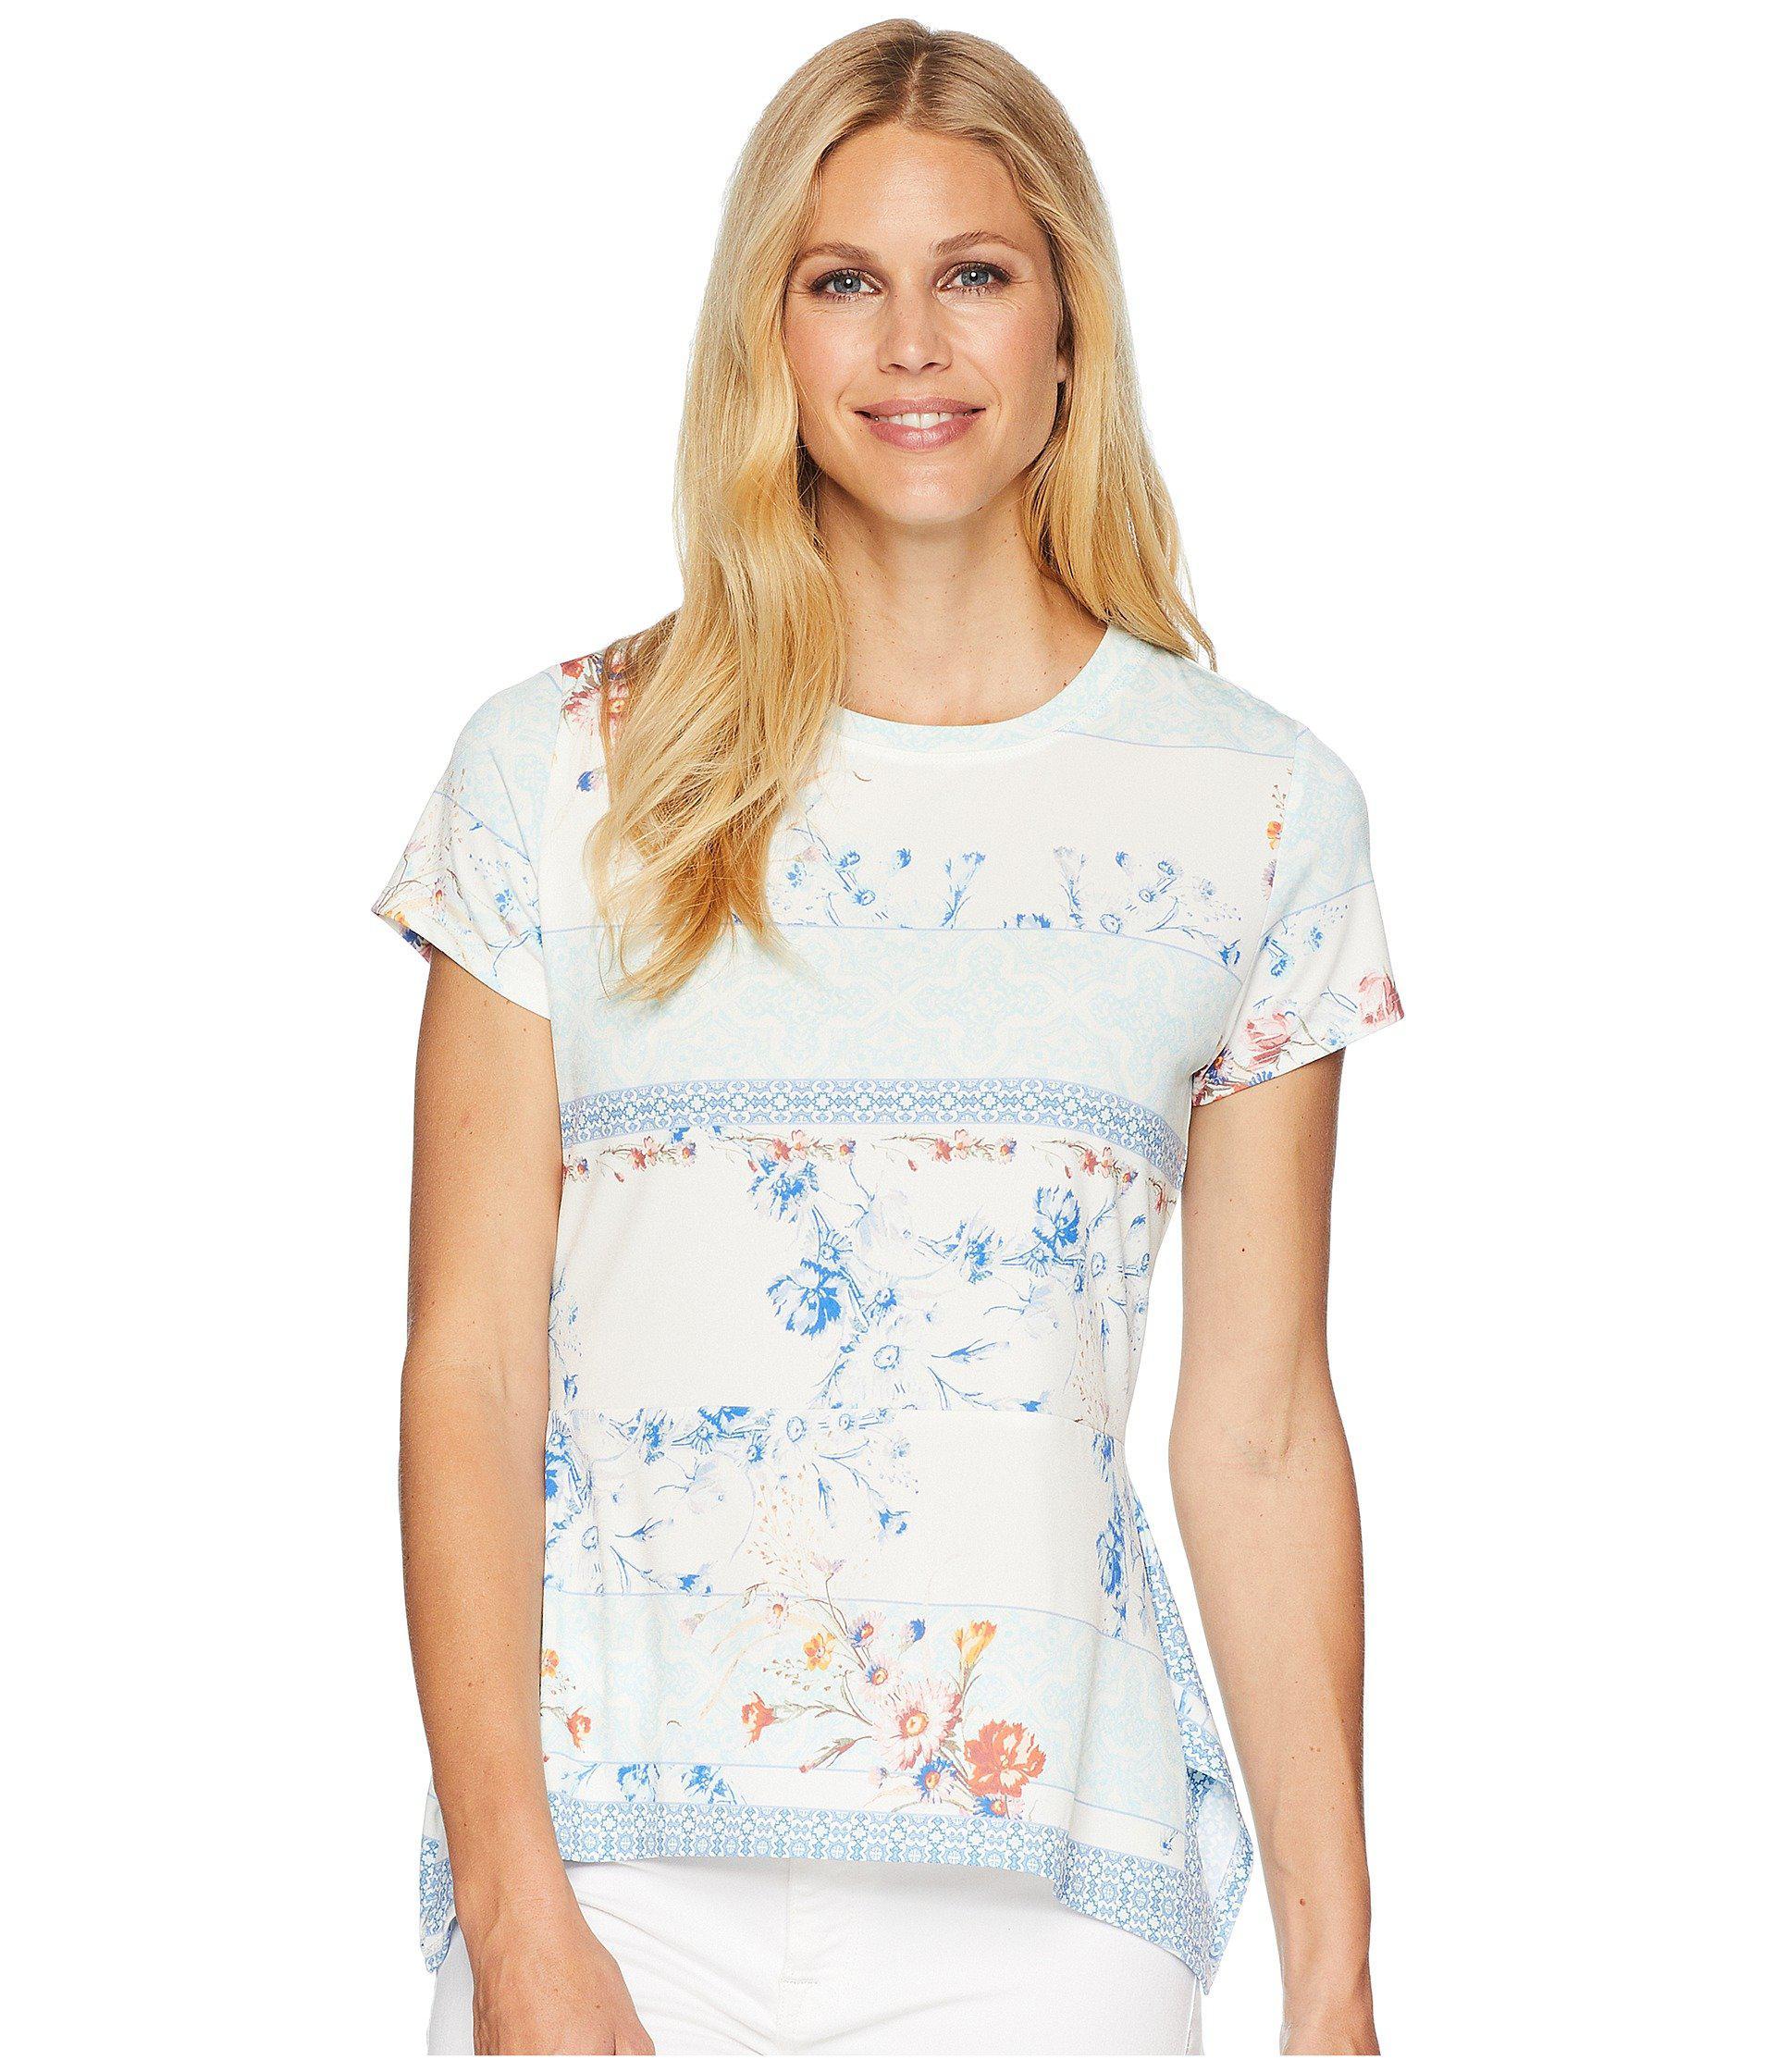 9780ecae77db26 Lyst - Ivanka Trump Printed Cap Sleeve Top With Peplum Hem in White